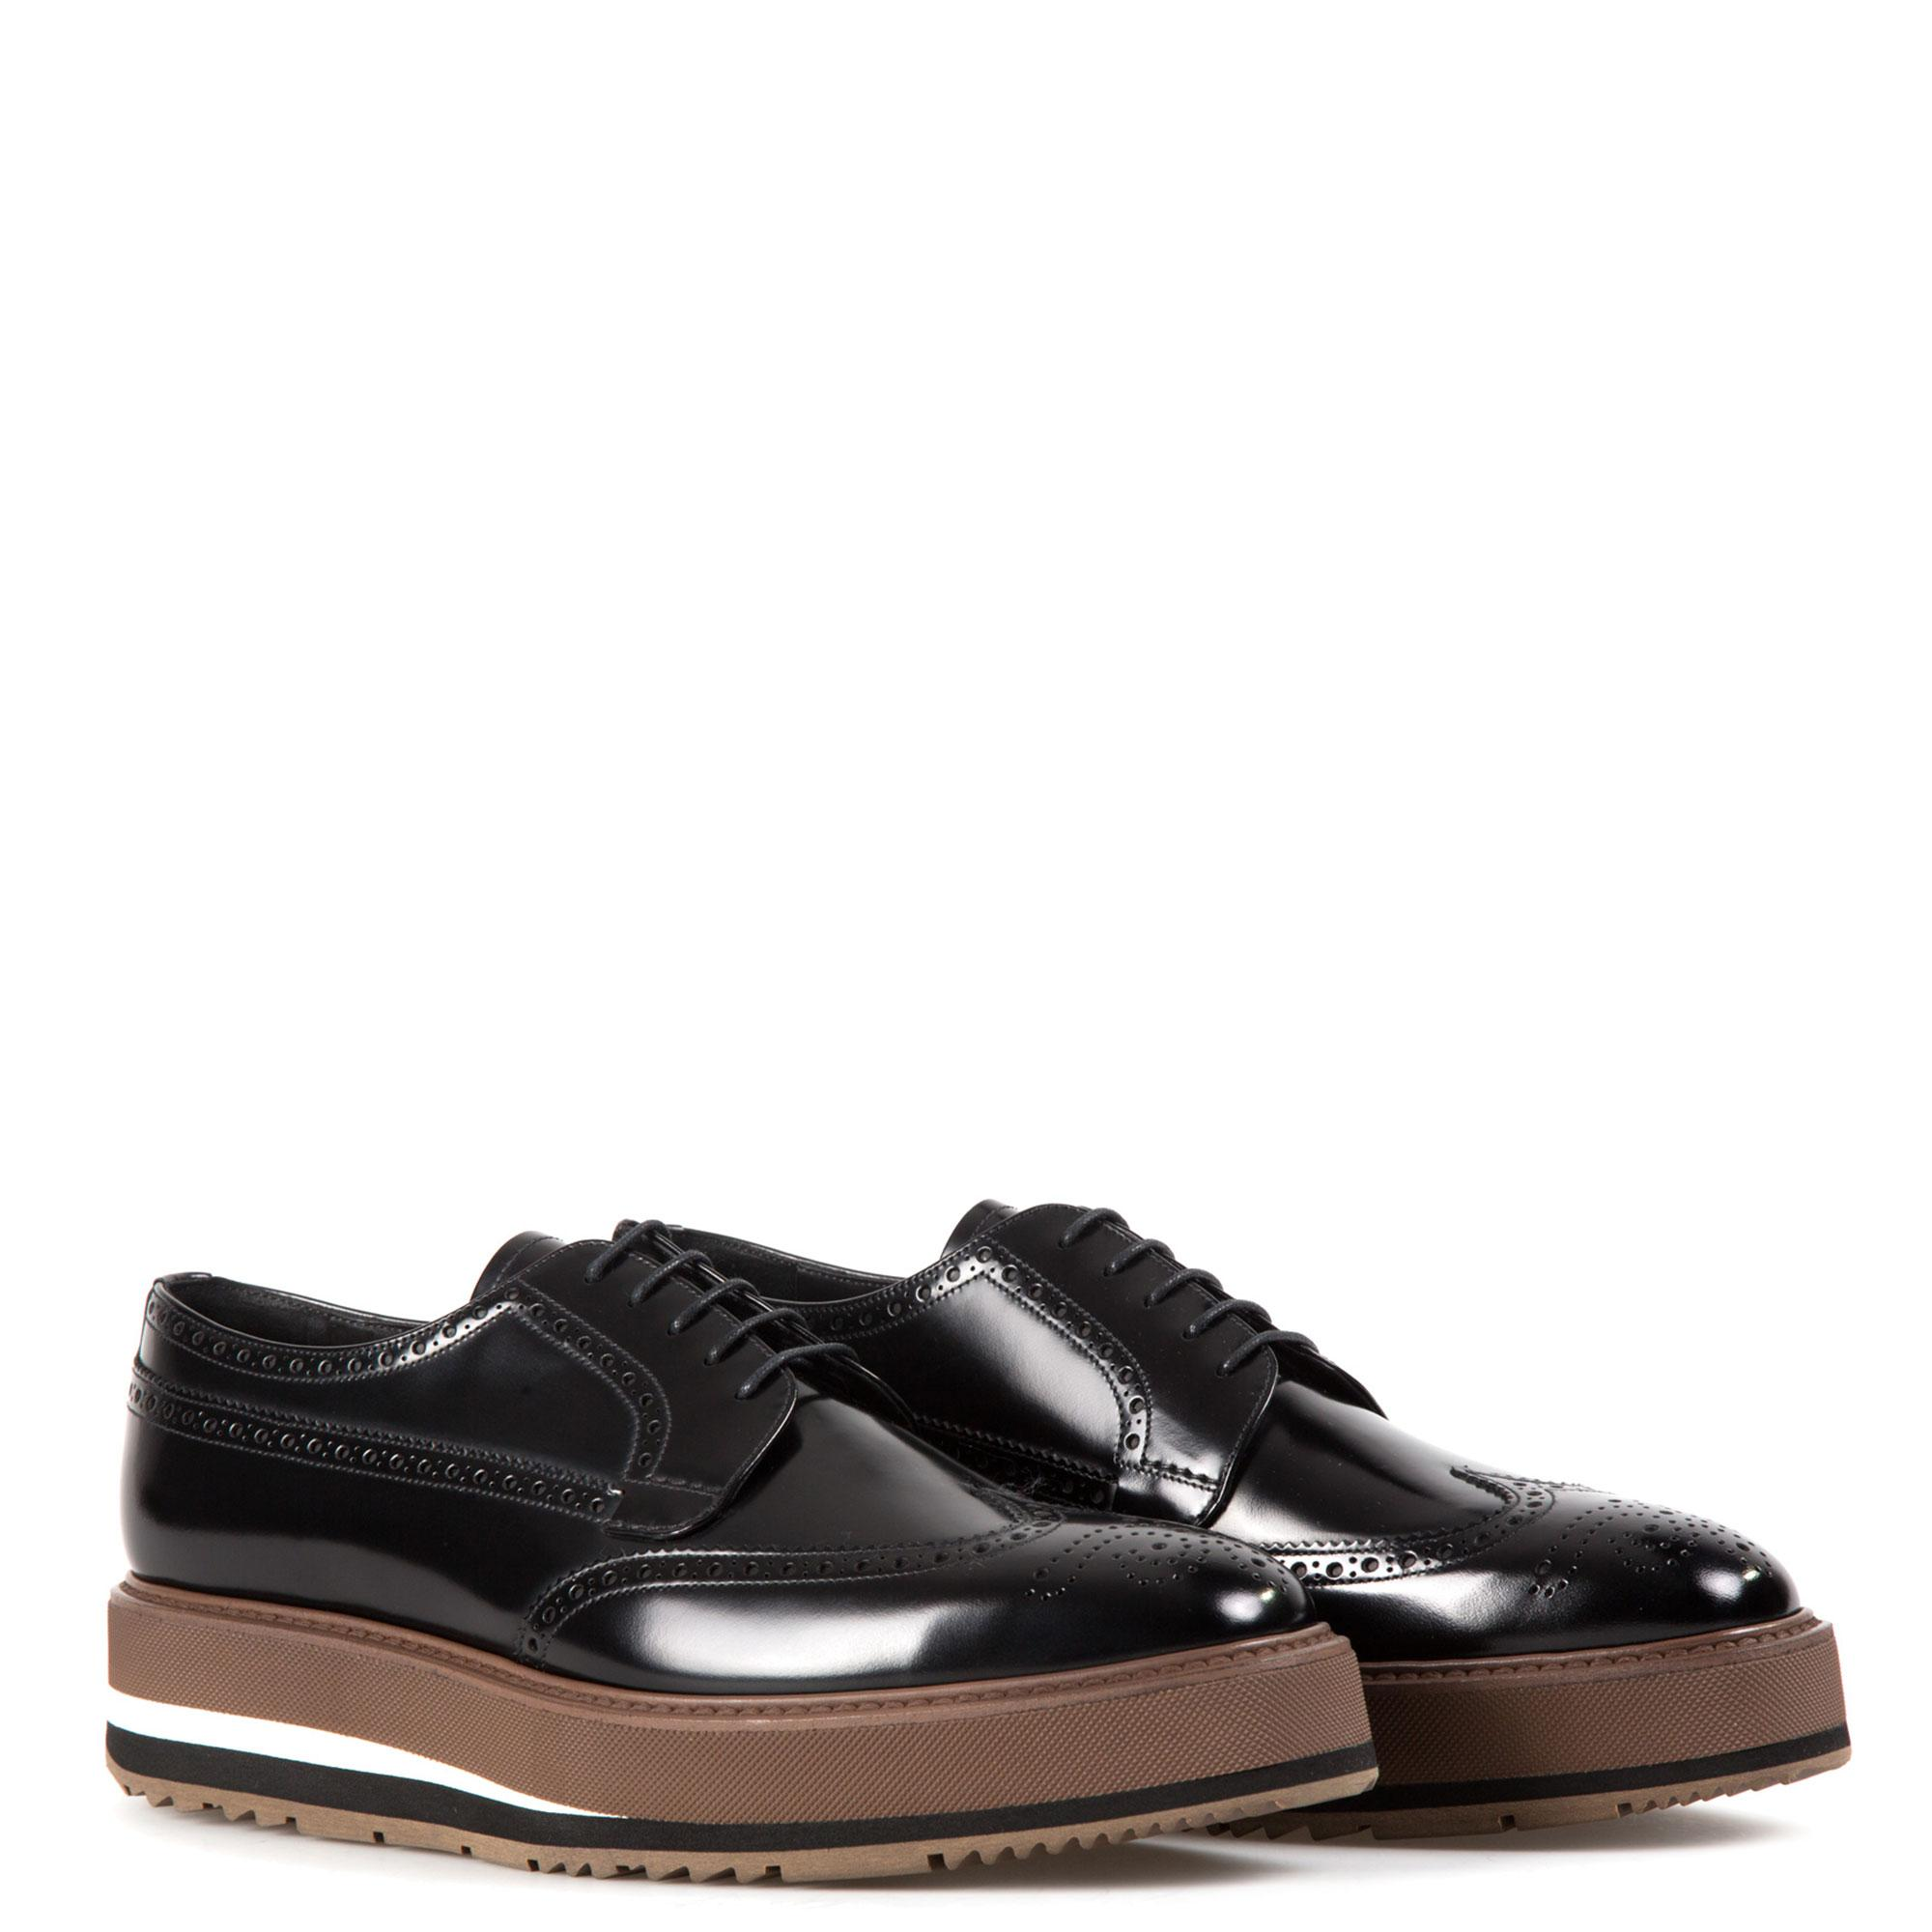 Prada Leather Derby Shoes With Platform in Black for Men